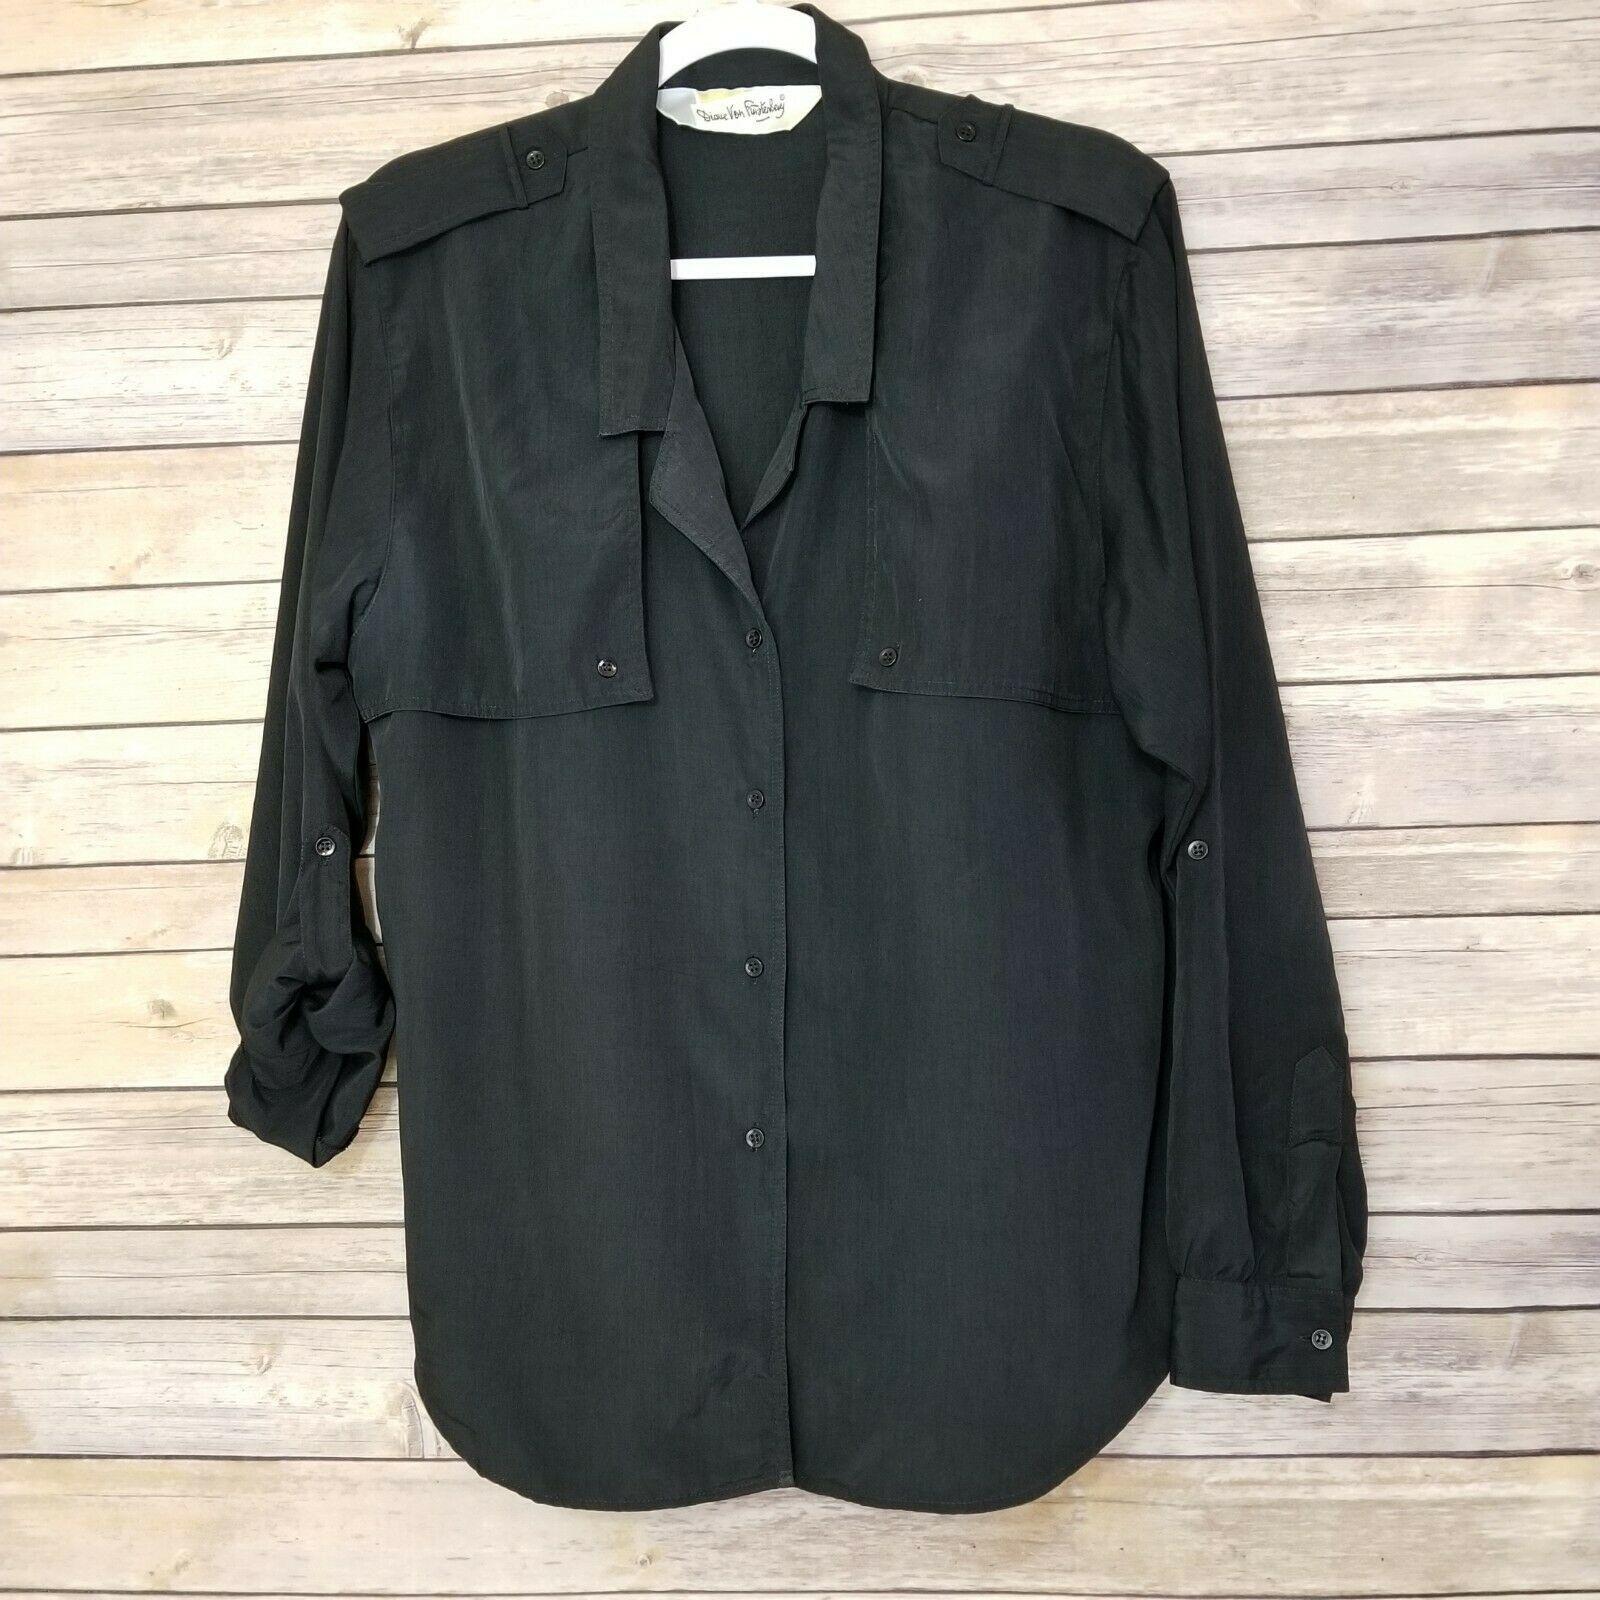 Vtg Diane von Furstenberg DVF Woman's Top Blouse Shirt Button Front Black Sz L